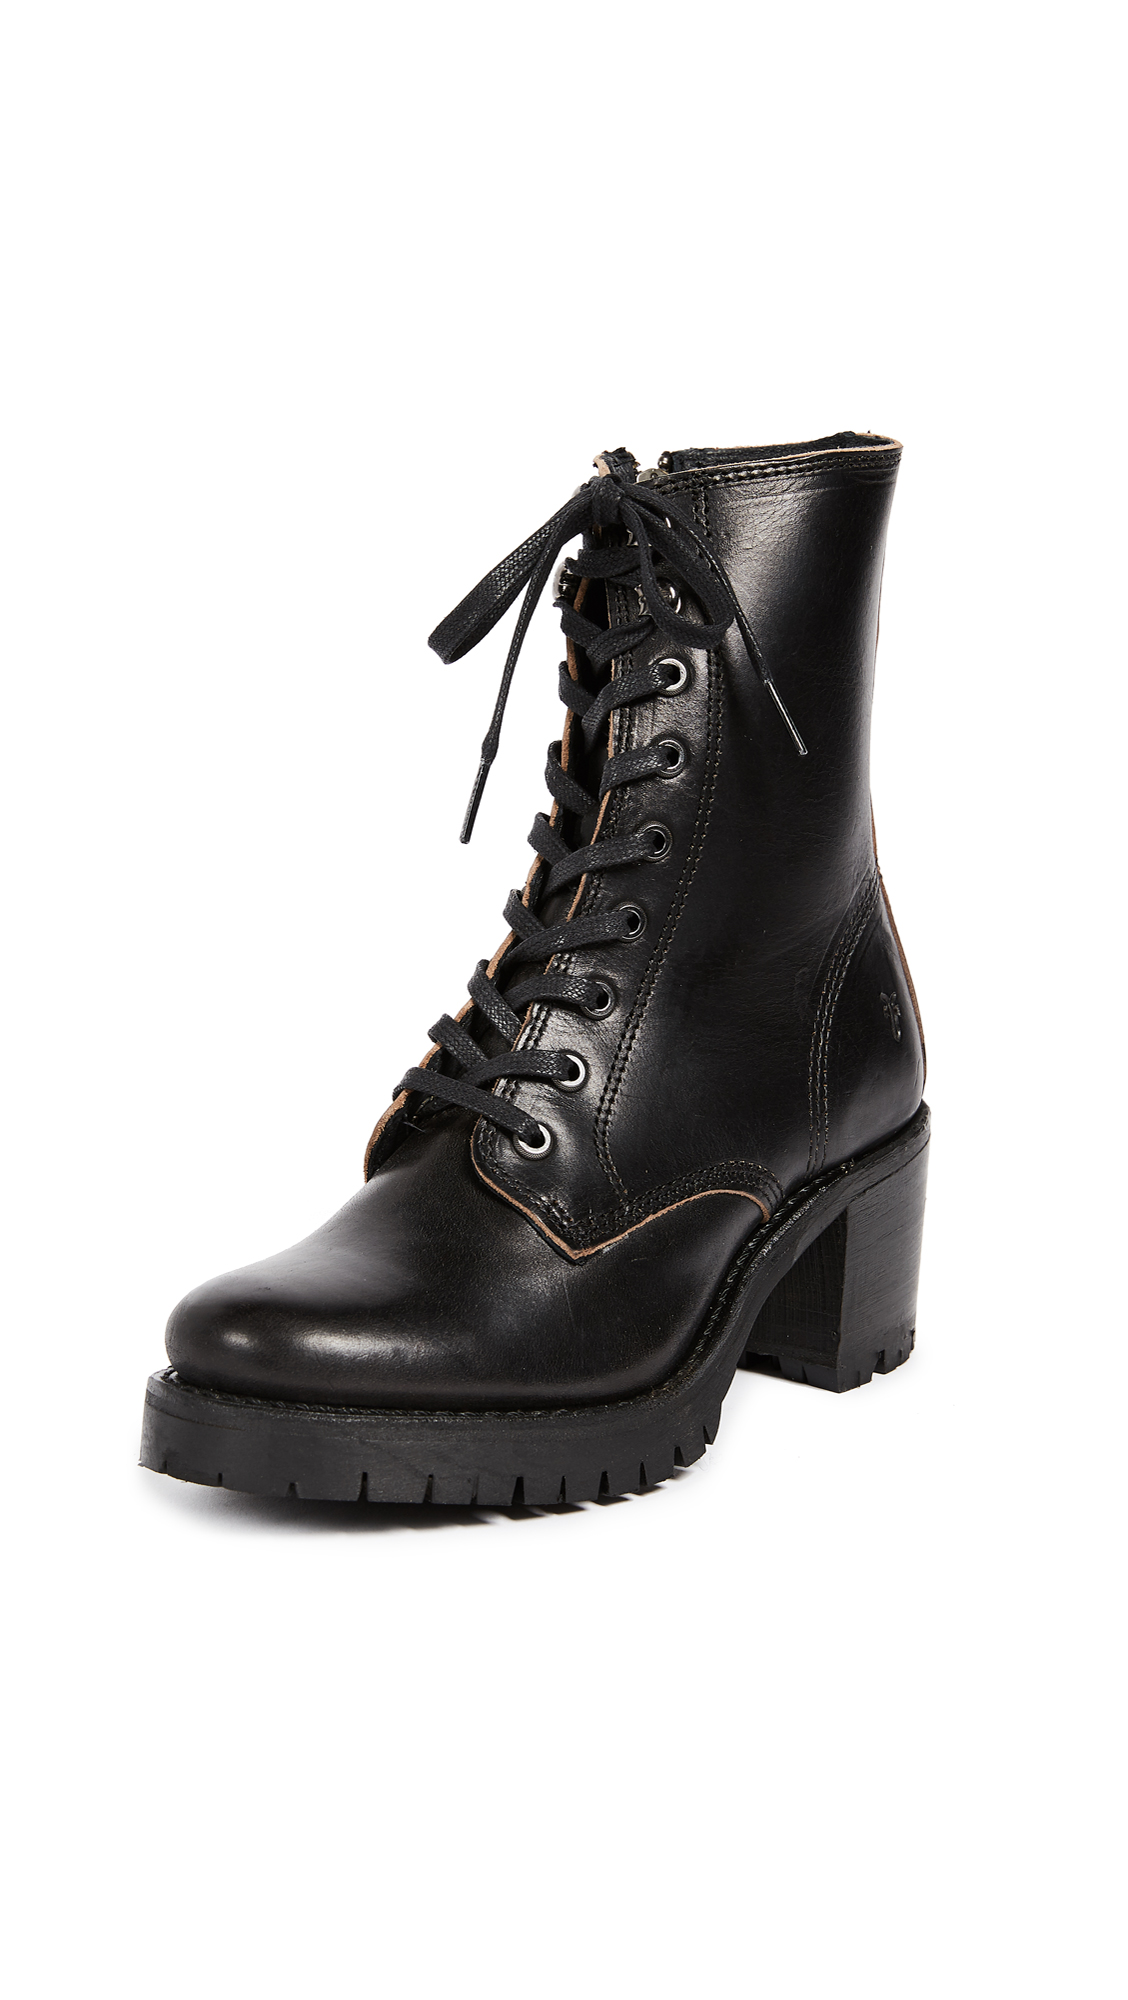 Frye Sabrina Combat Heeled Boots - Black